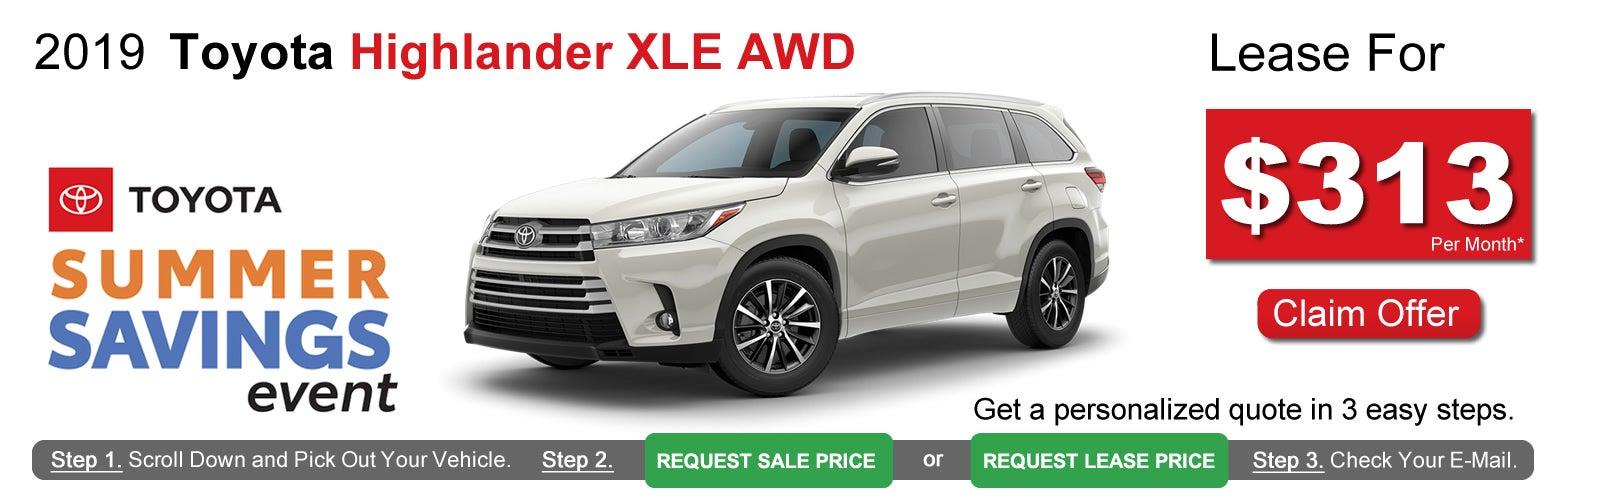 Toyota Lease Deals >> Toyota Highlander Lease Deals Near Boston Ma Lease Offers